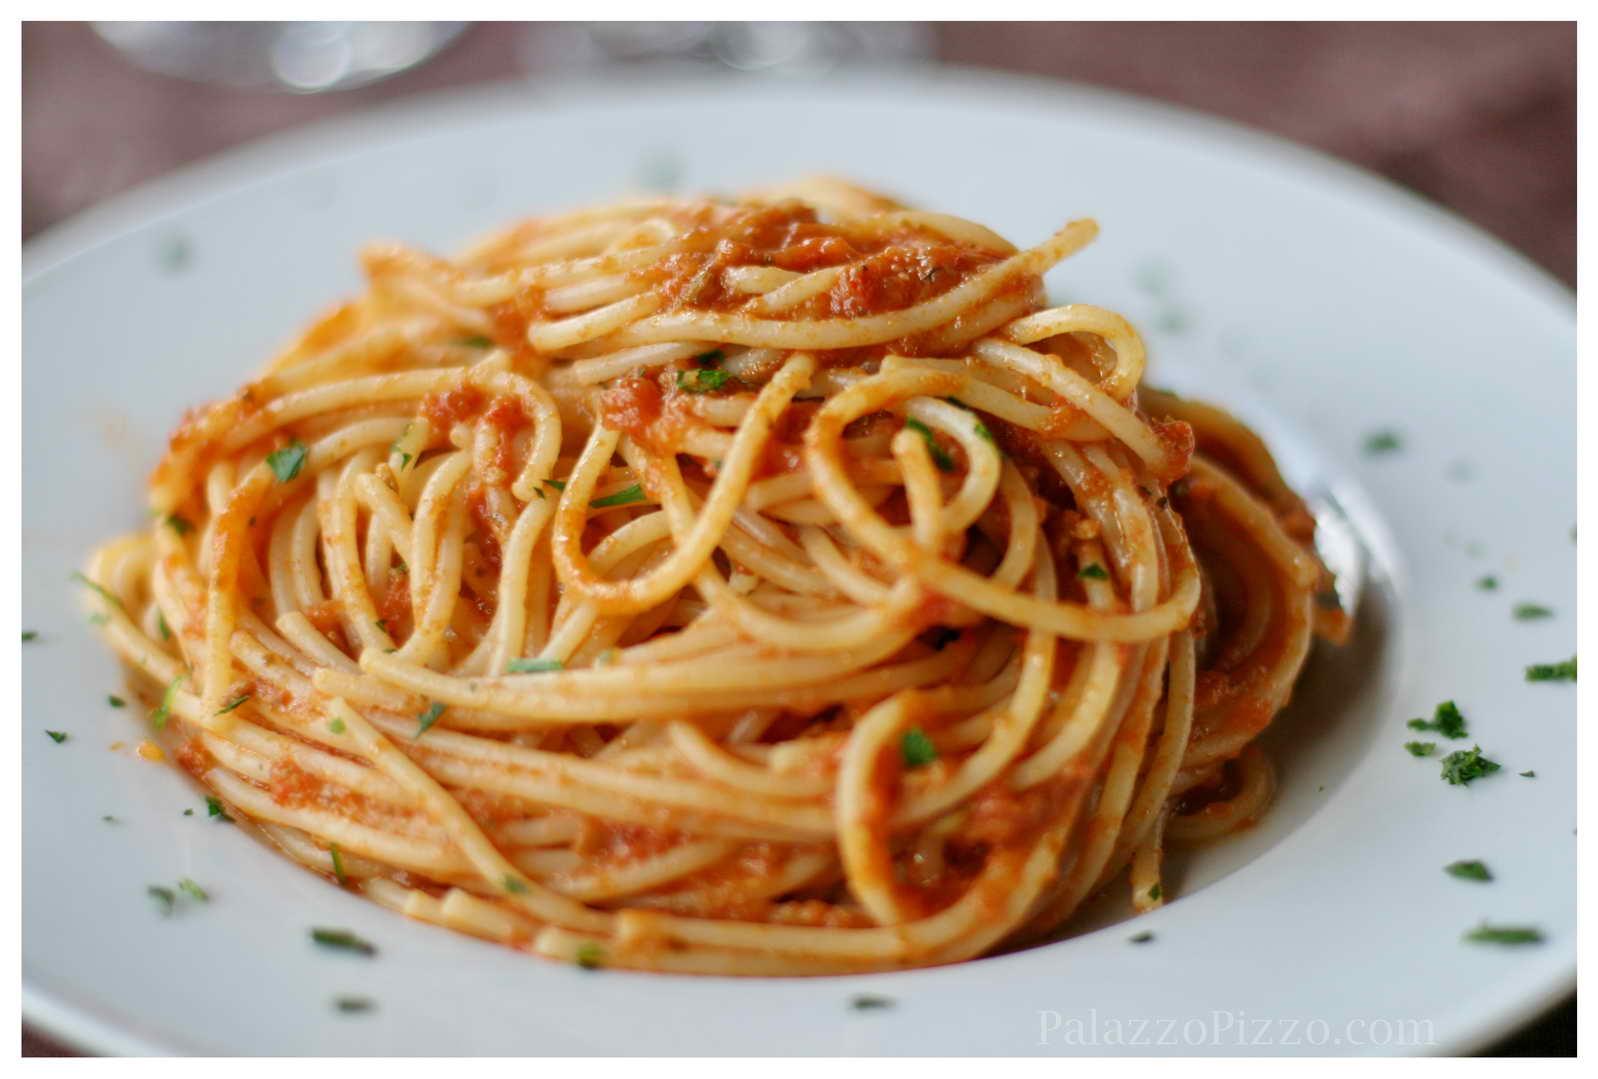 pp charming Pizzo pasta.jpg